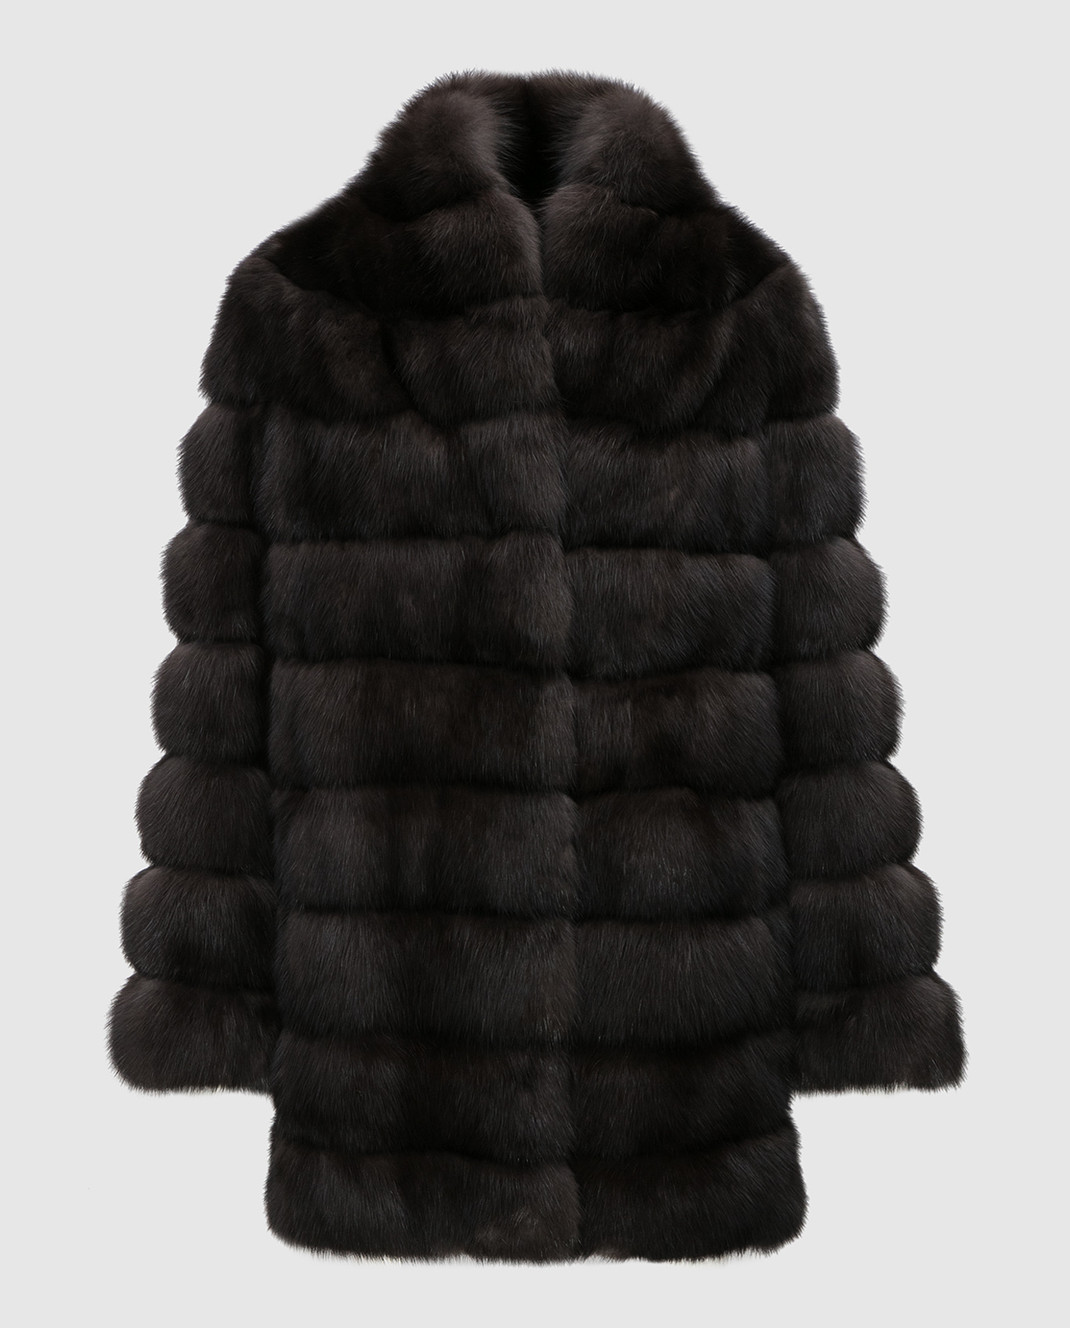 Real Furs House Черное меховое пальто SBR29548DARK